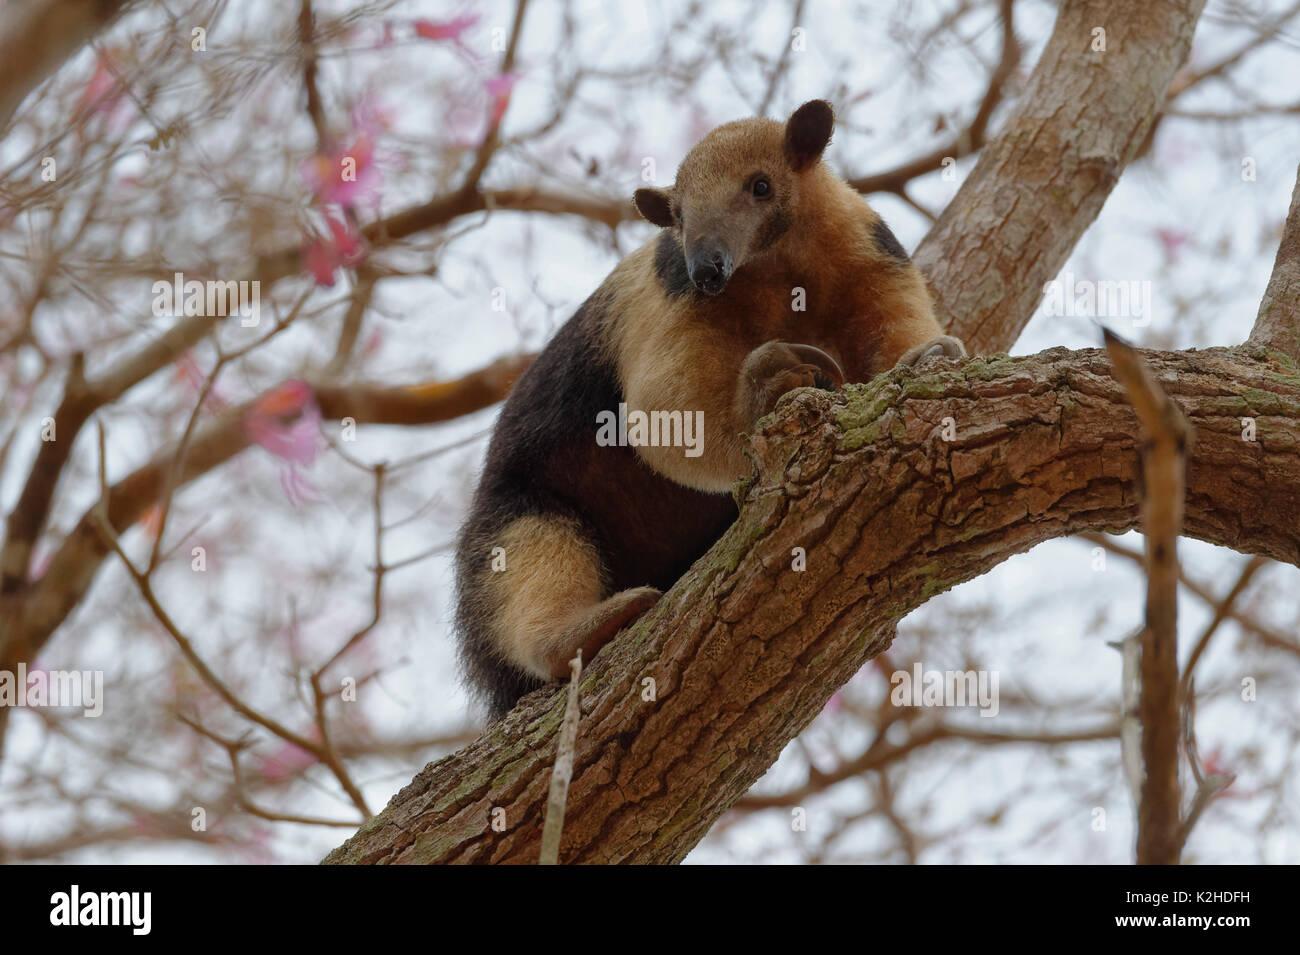 Southern tamandua or collared anteater or lesser anteater (Tamandua tetradactyla) climbing on a tree, Pantanal, Mato Grosso, Brazil - Stock Image